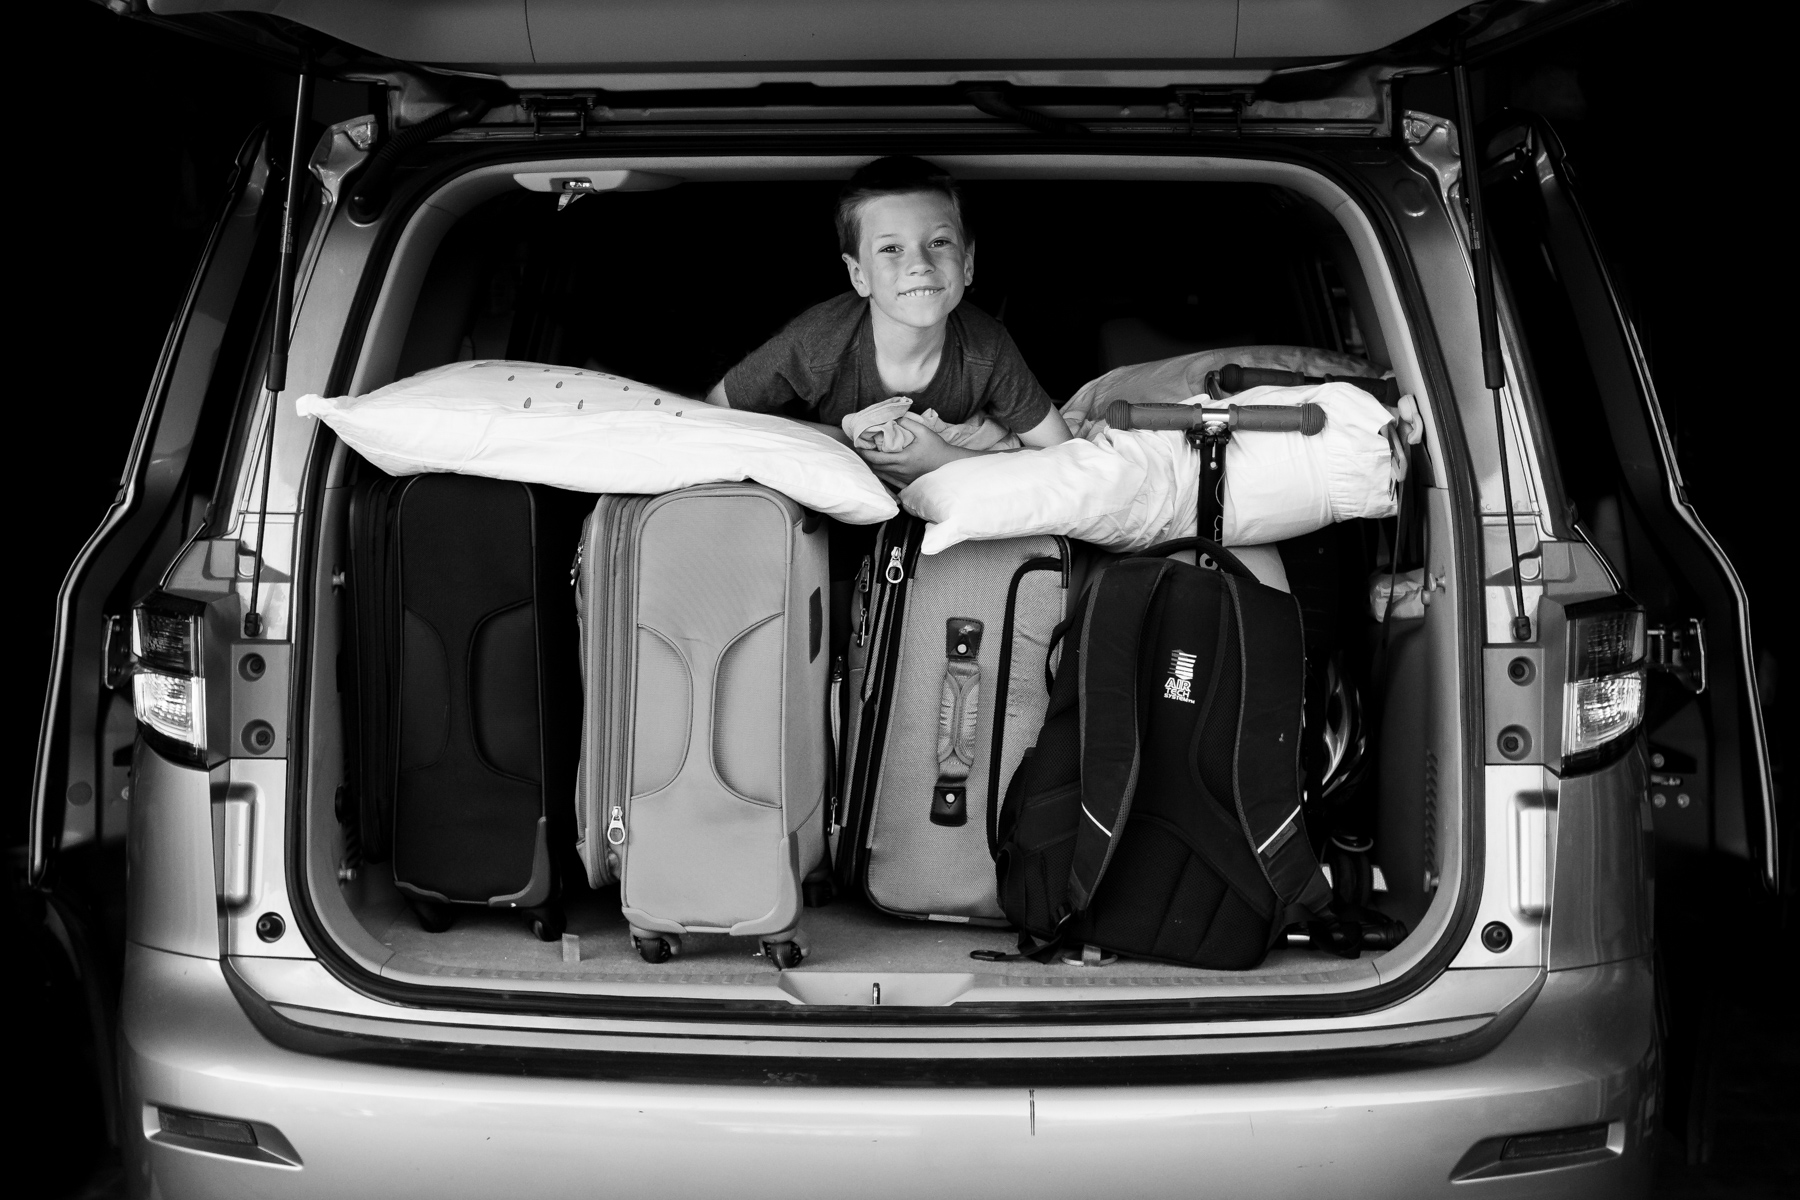 minivan-claremont-1.jpg